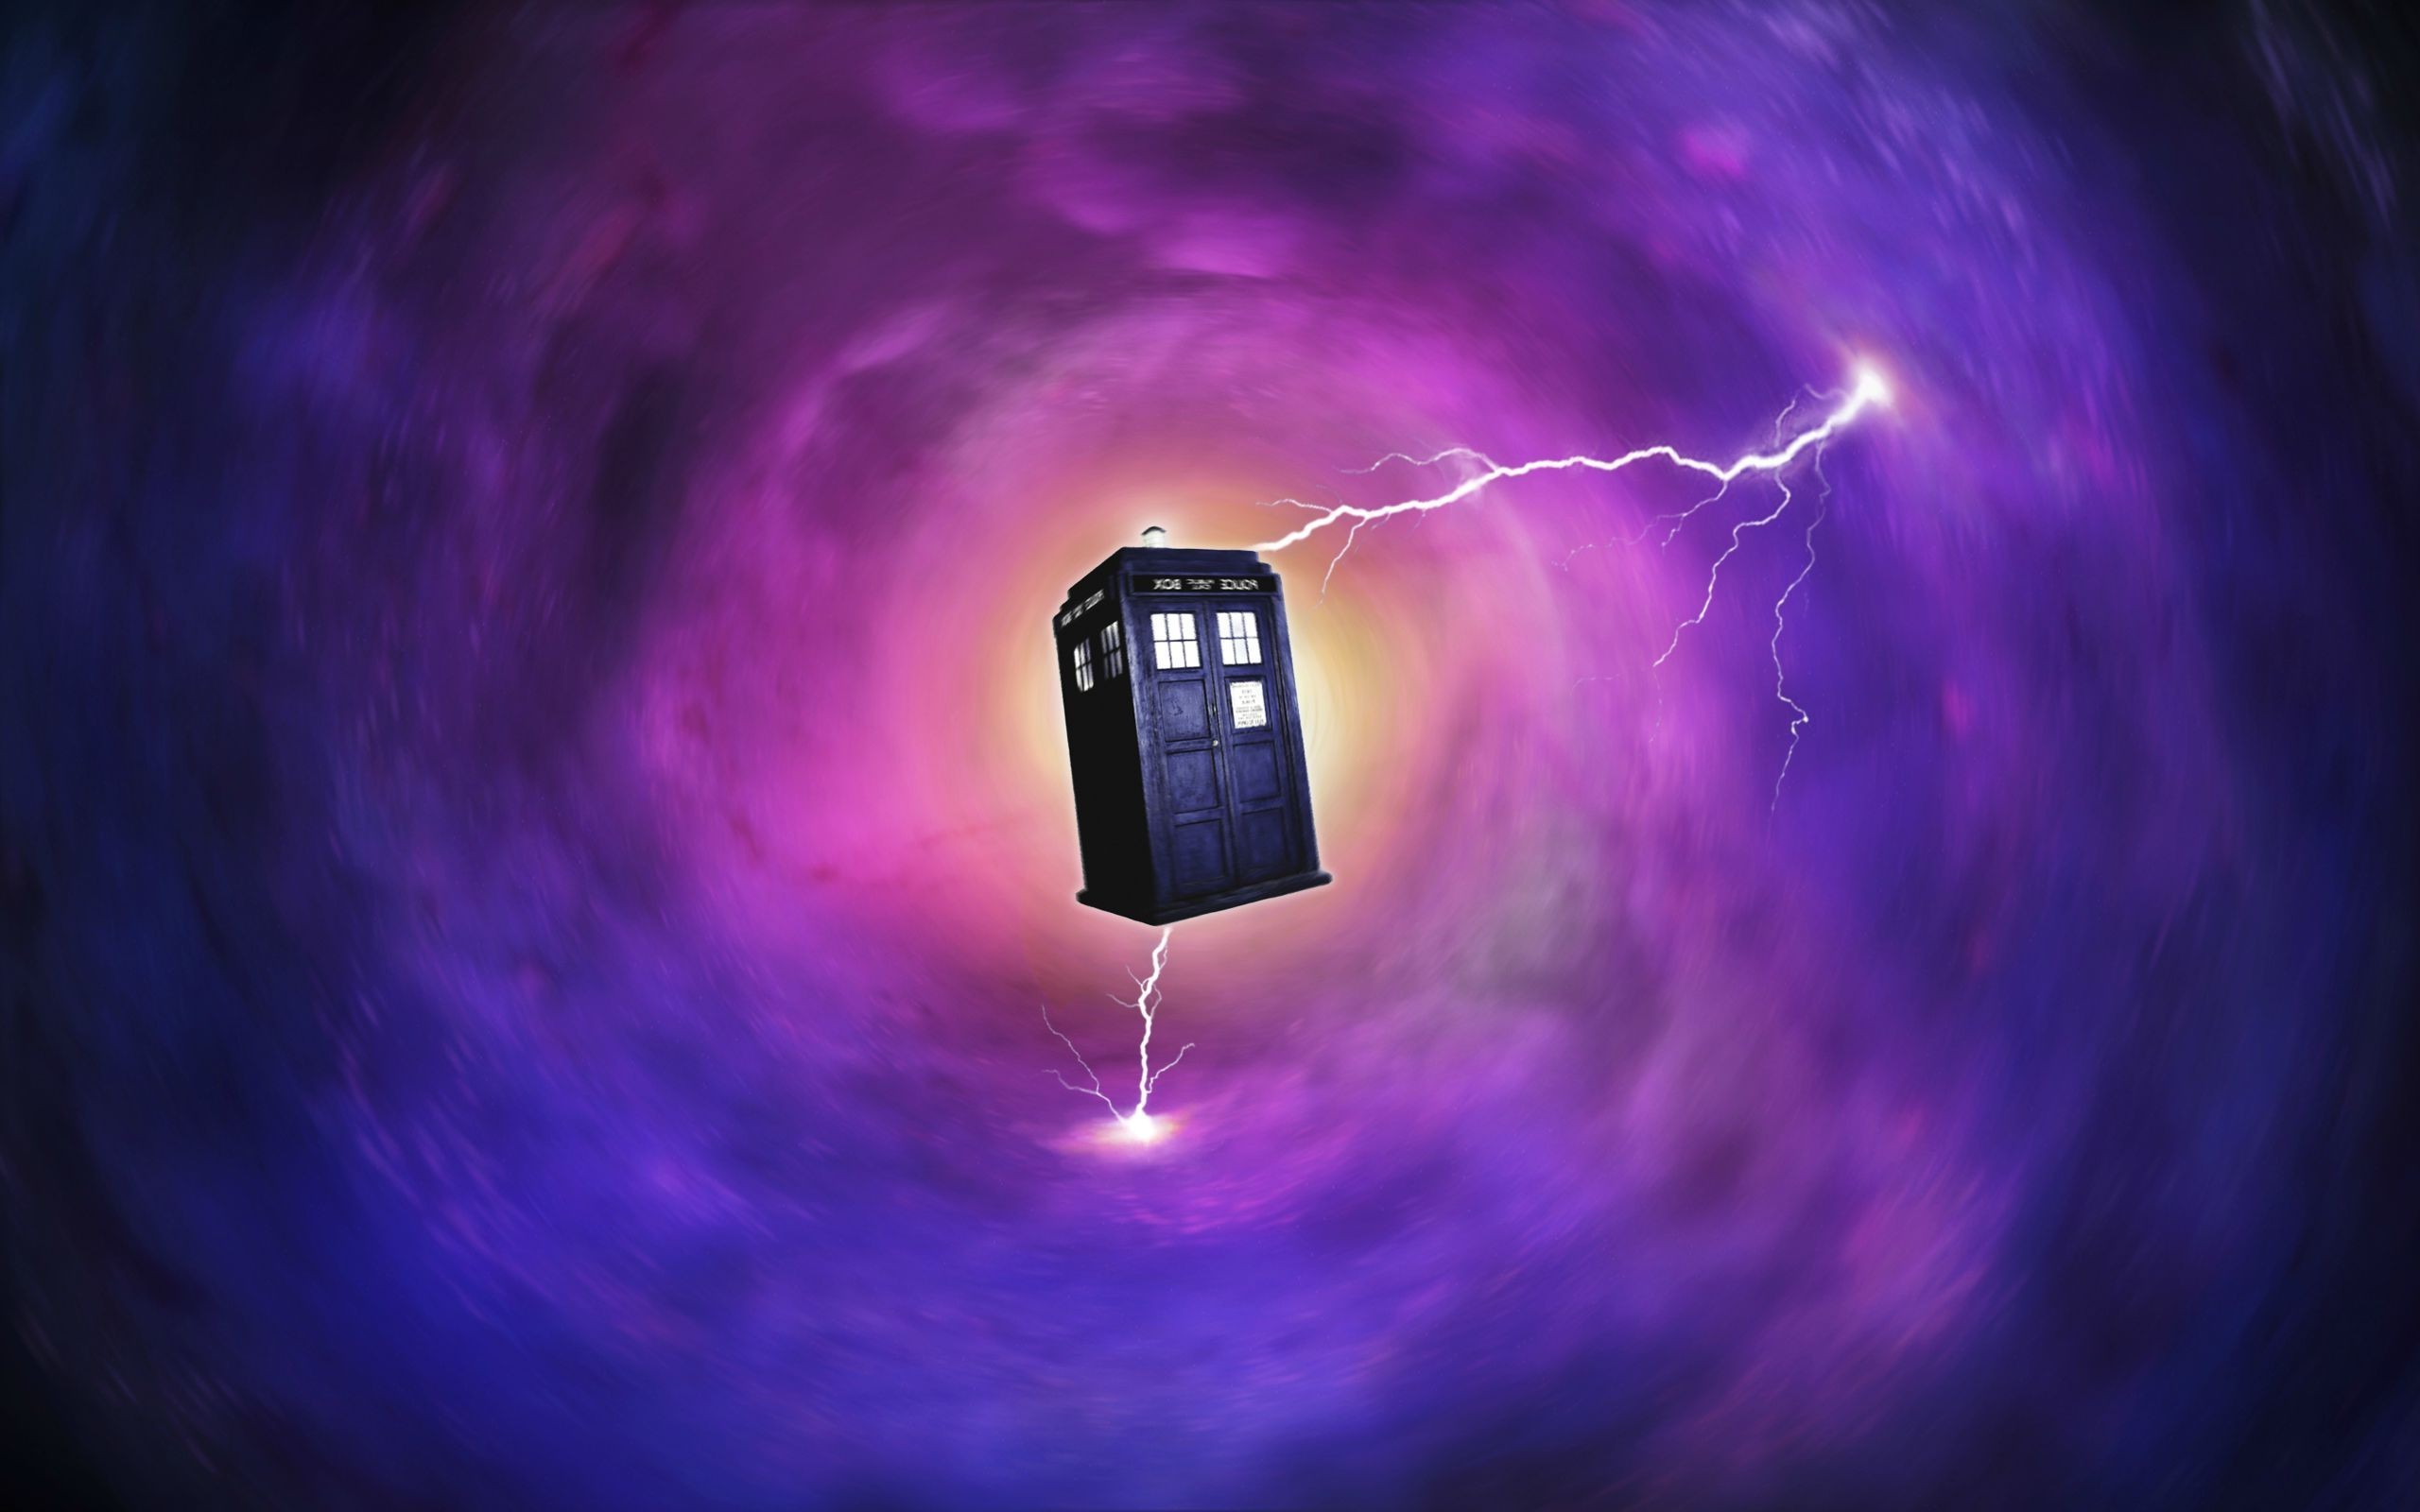 Doctor Who Wallpapers Tardis